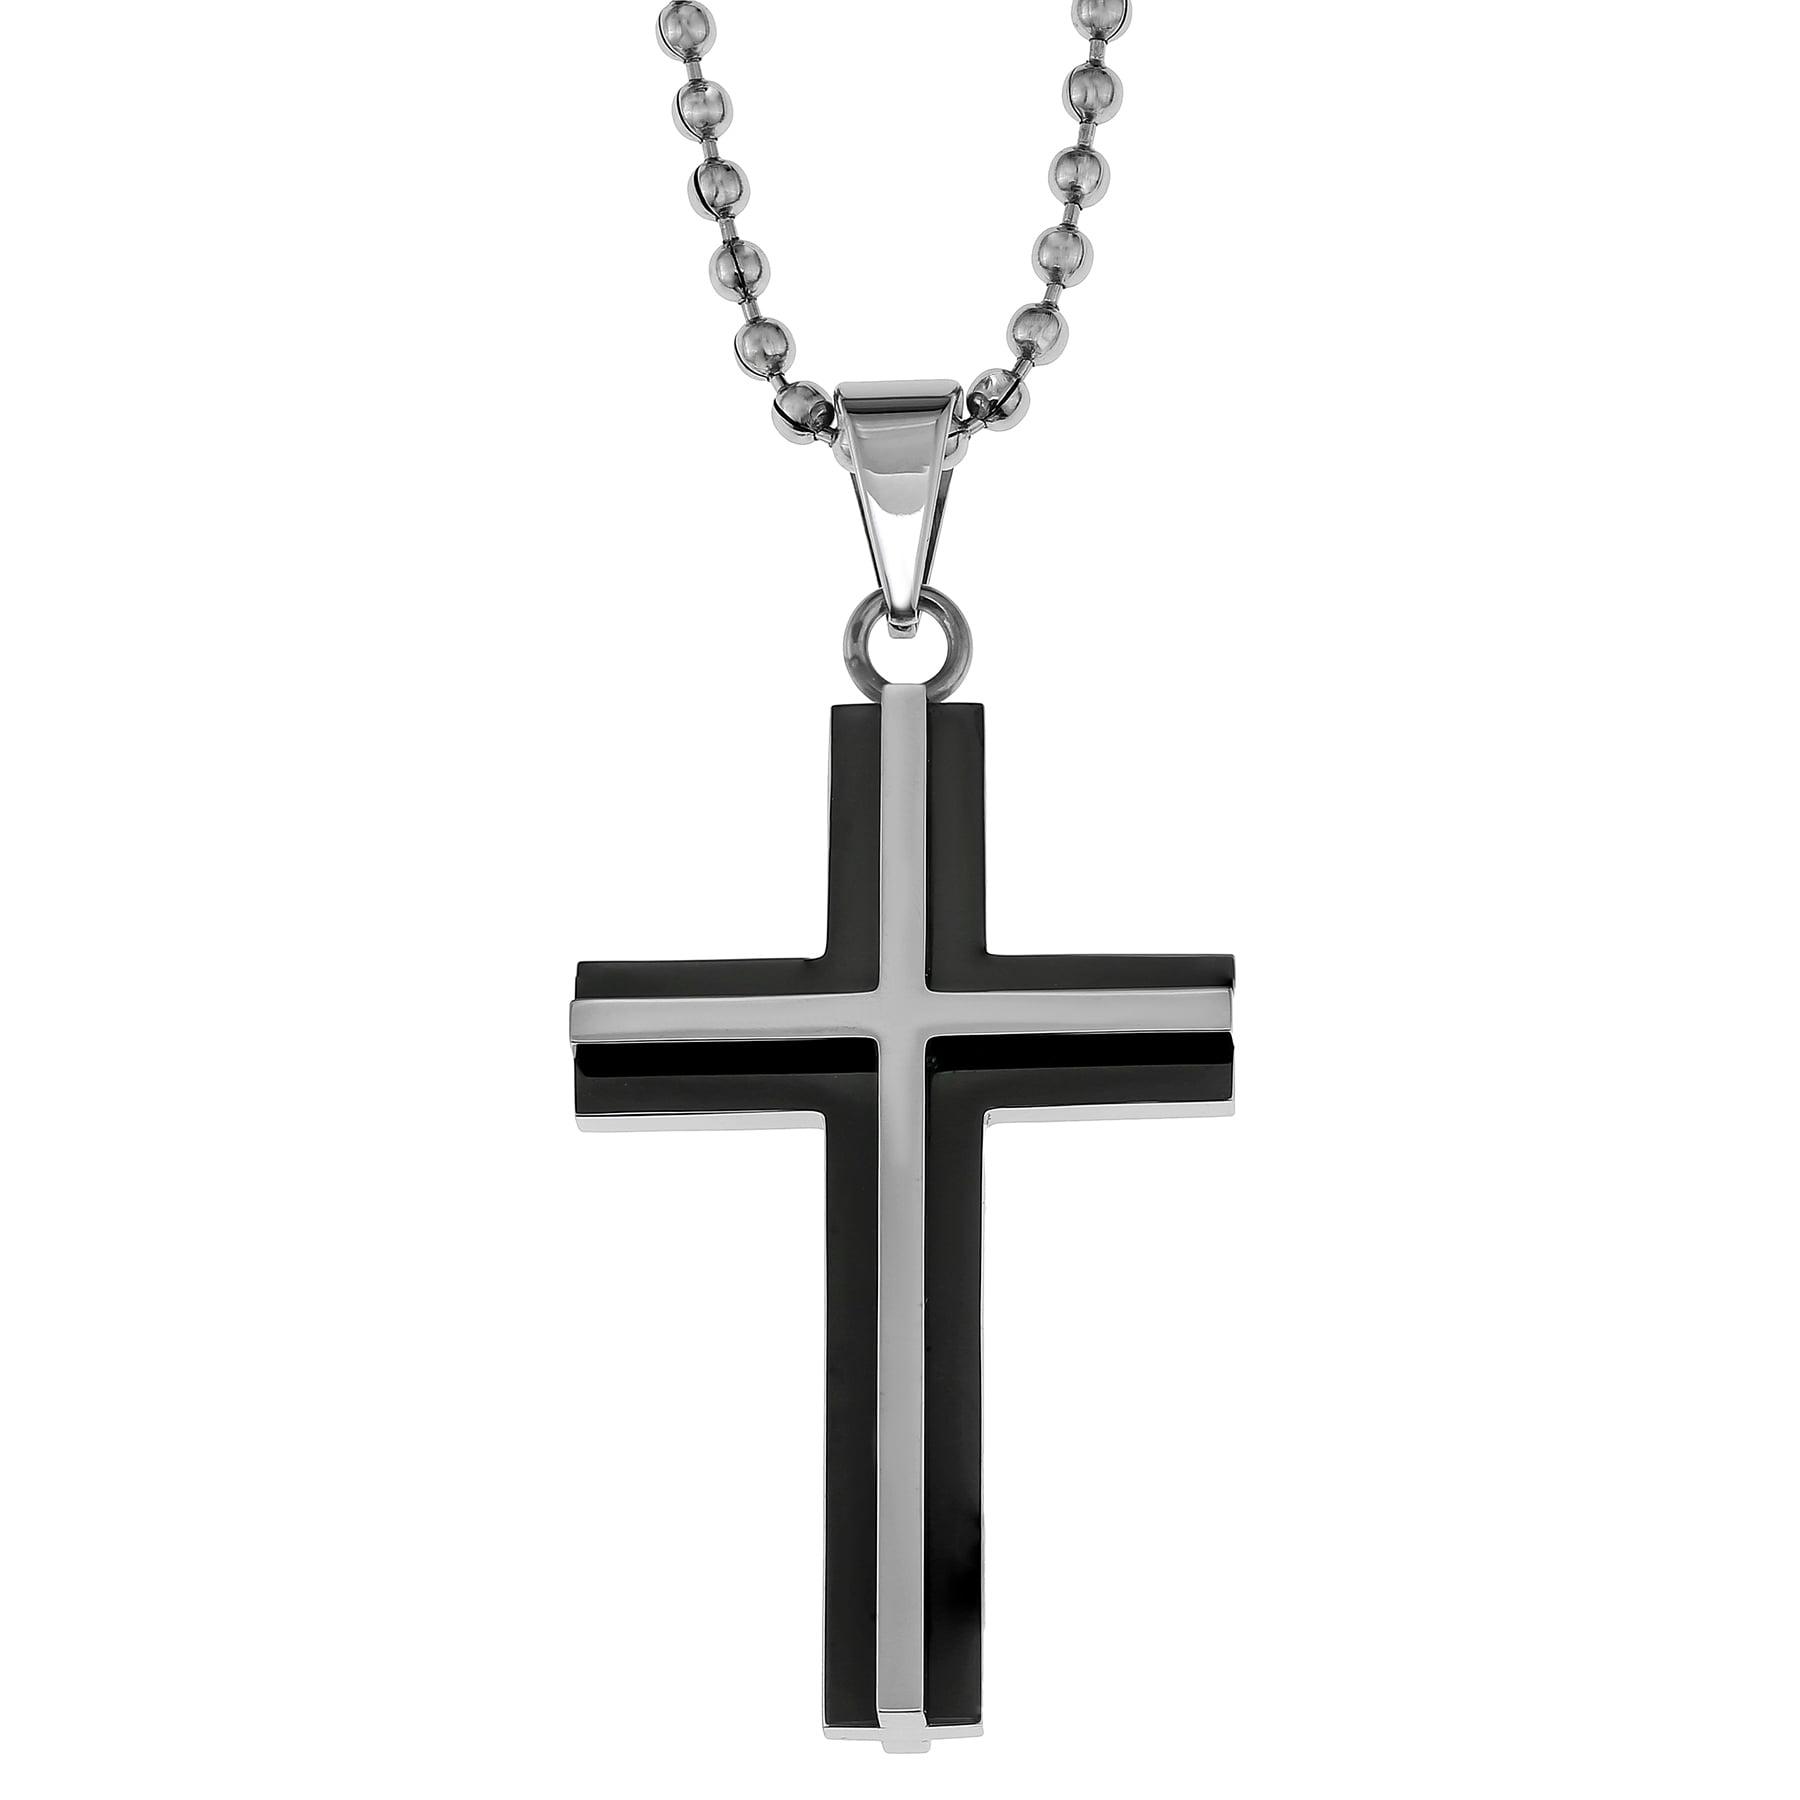 GOLDNROX Stainless Steel Cross Pendant